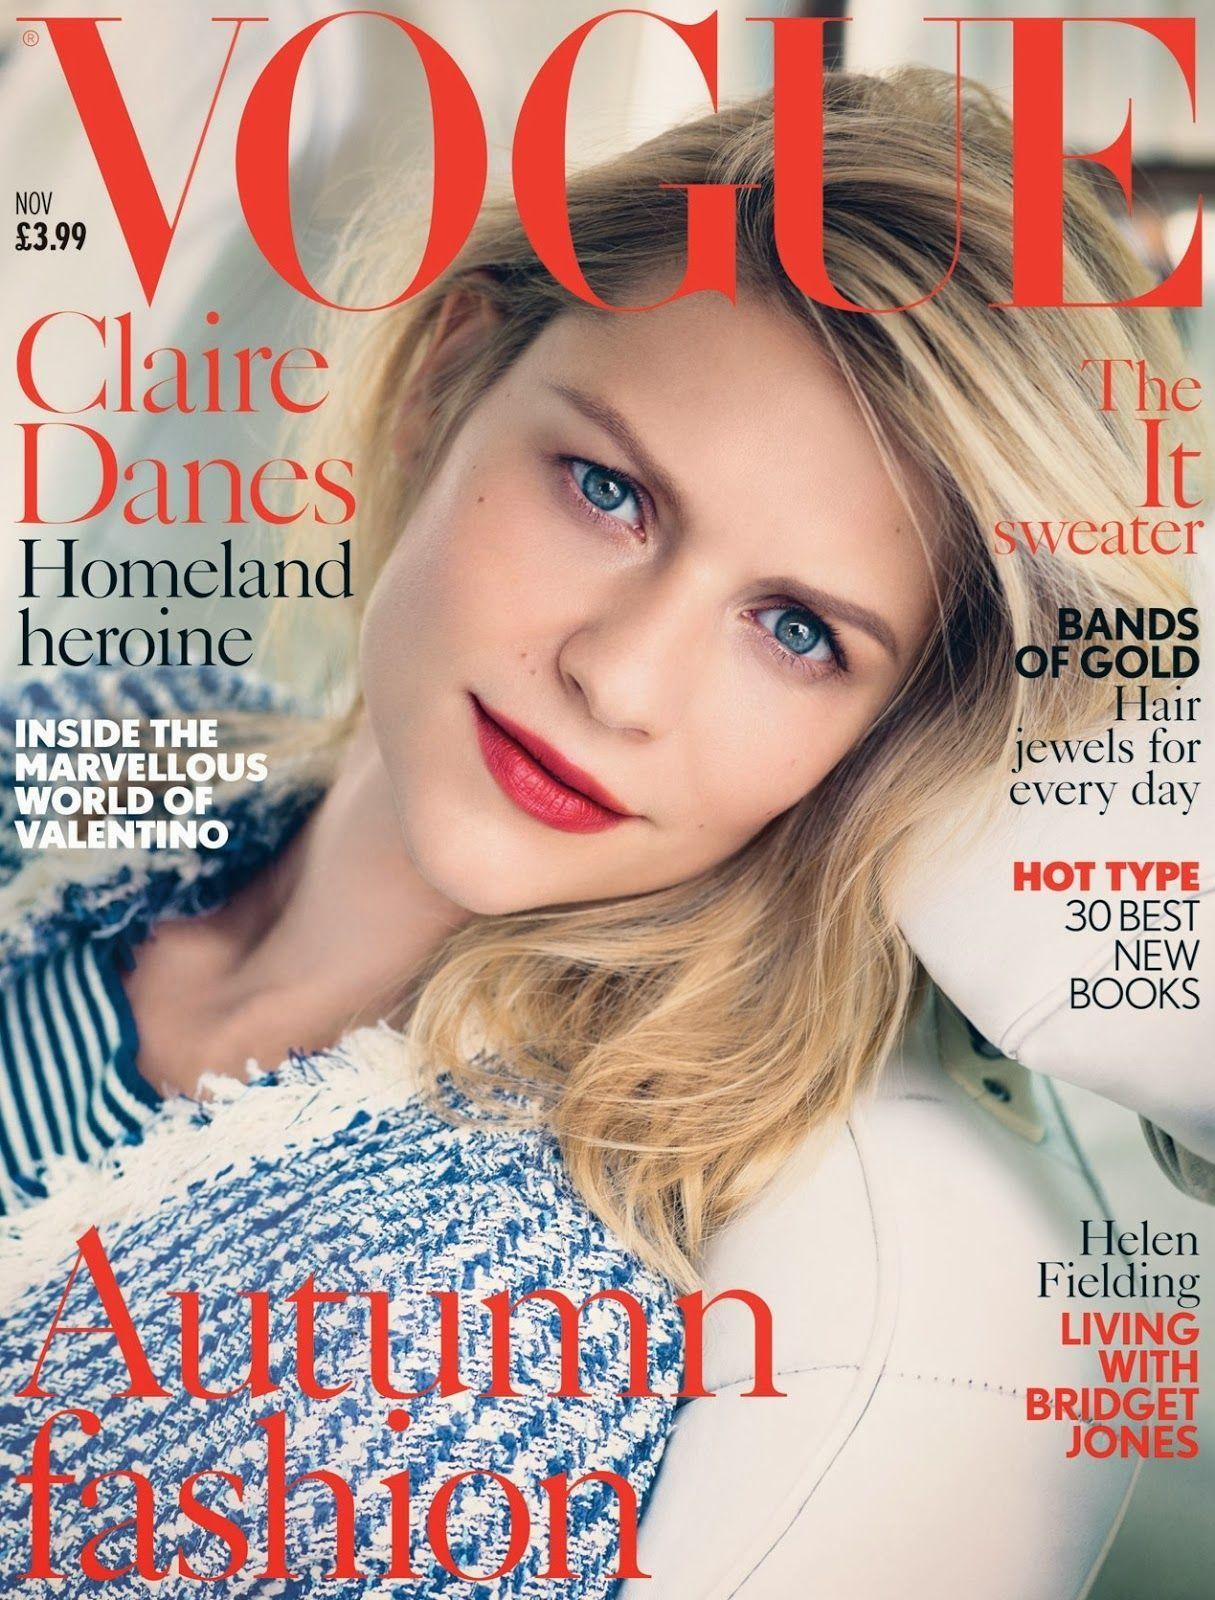 Fashion style Festive top 5 flashback fashion magazine covers for lady